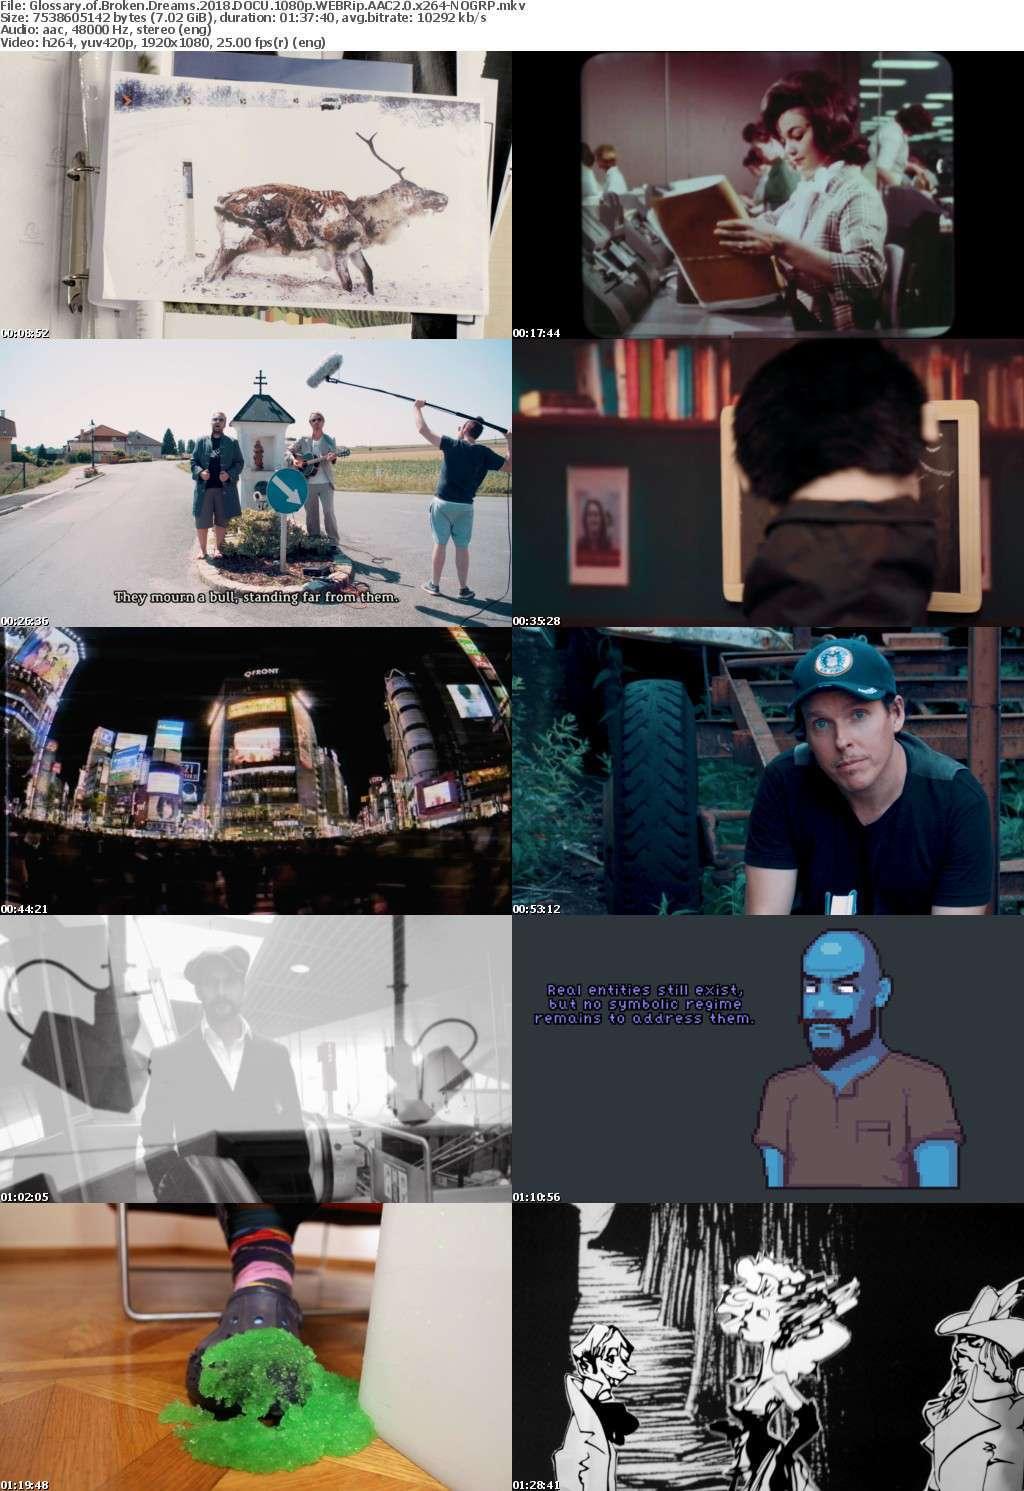 Glossary of Broken Dreams 2018 DOCU 1080p WEBRip AAC2 0 x264-NOGRP